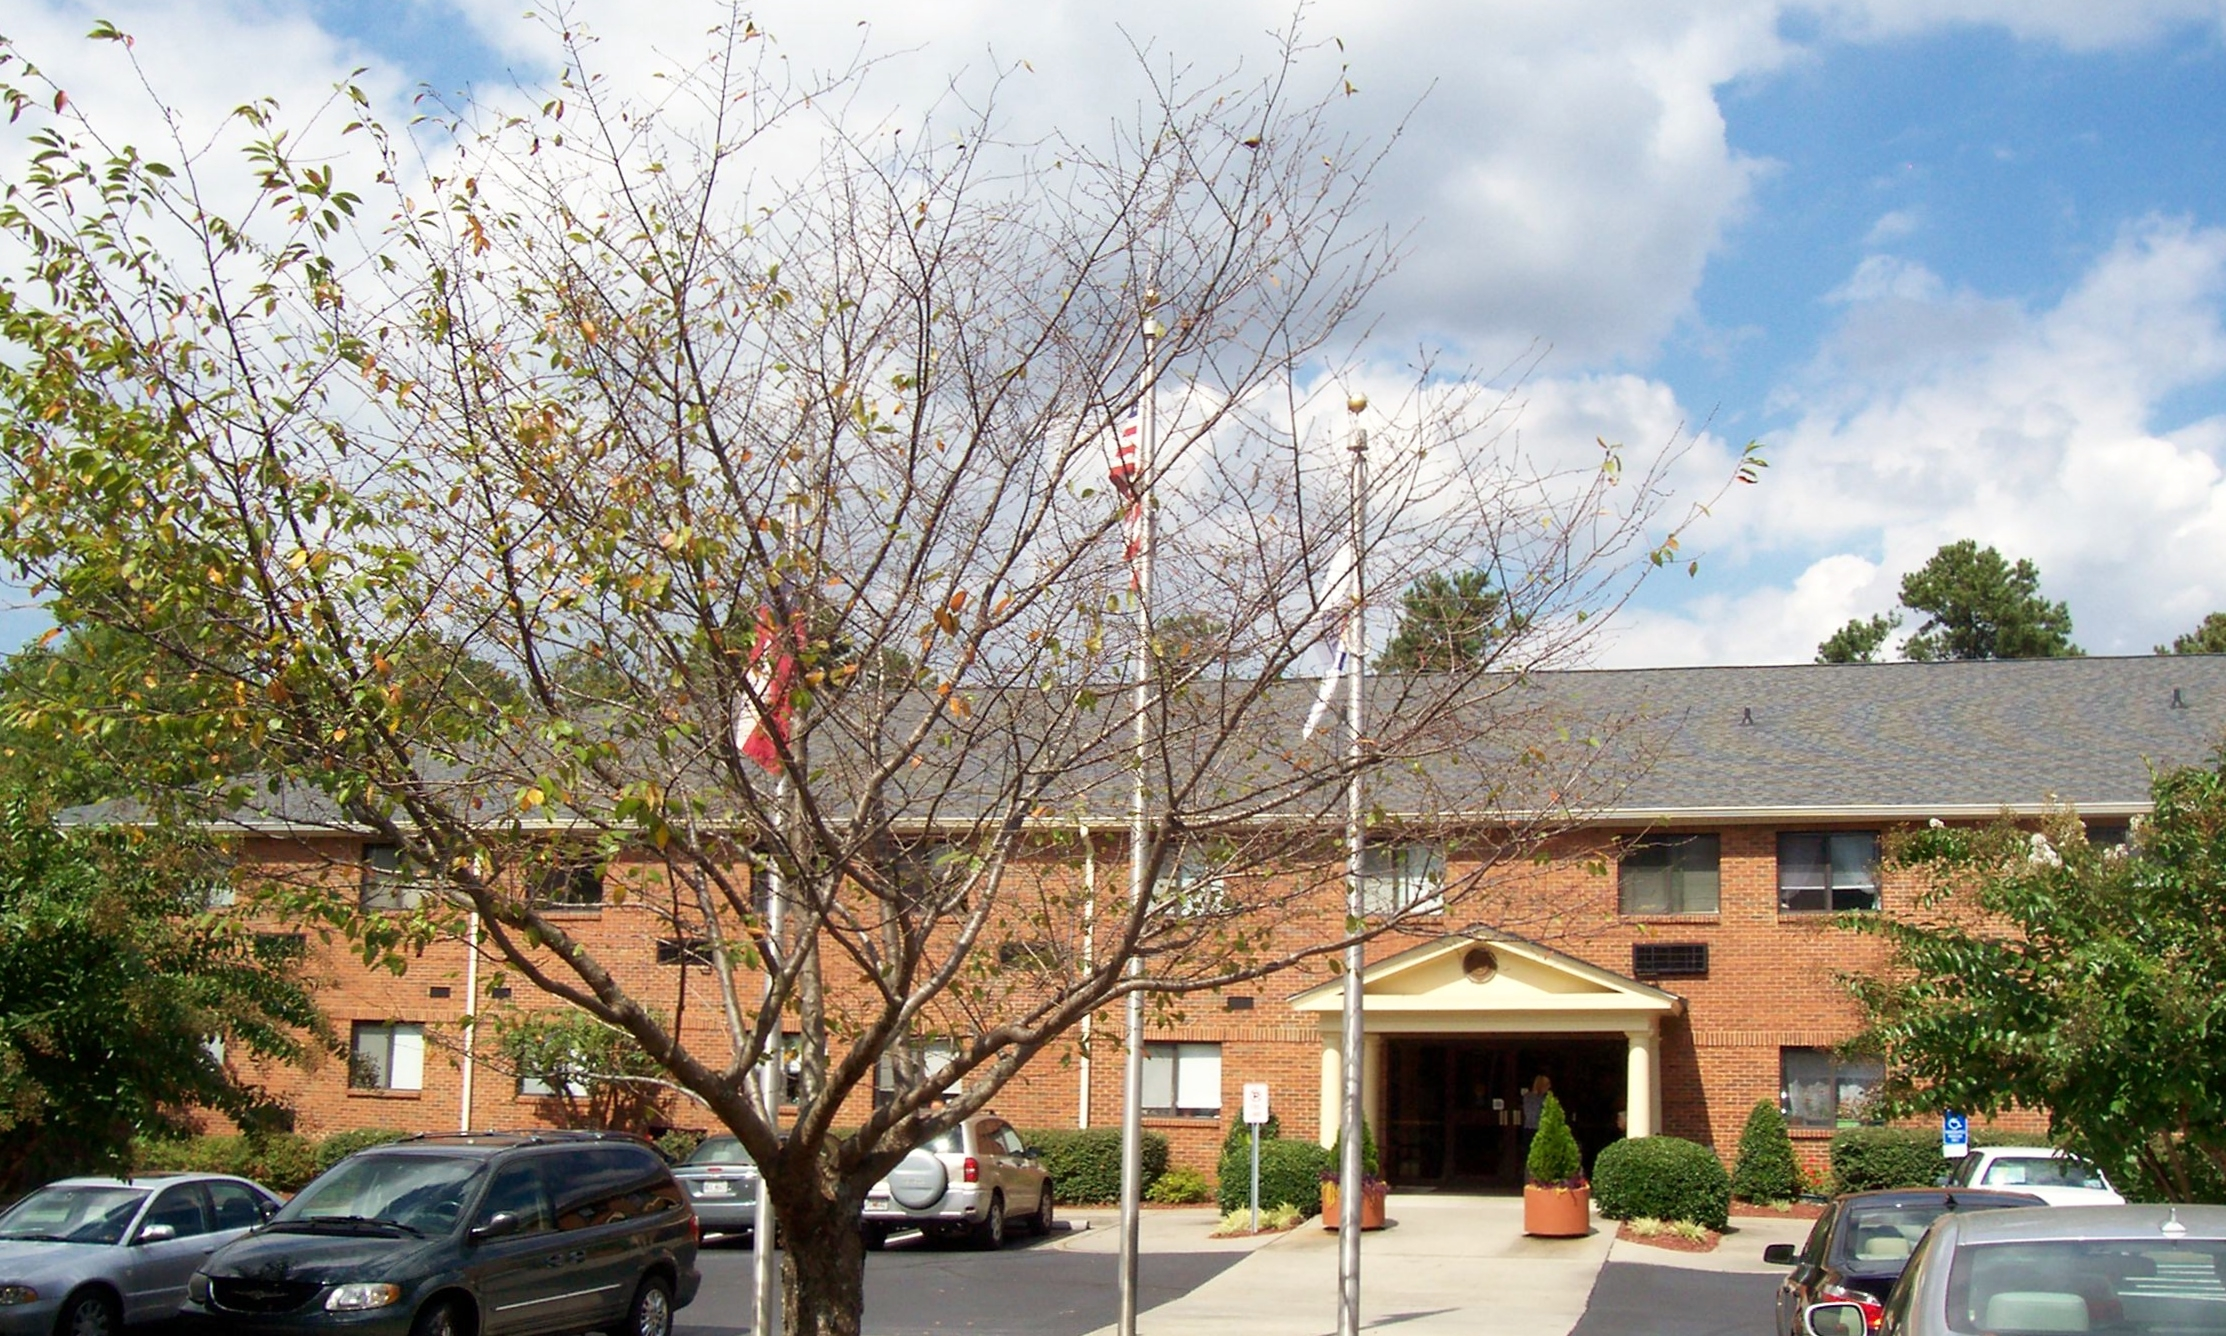 AHEPA One Senior Apartments - 2025 Ludovie LaneDecatur, GA 30033(404) 315-6800TTY: (866) 694-5824 or 711 (English)TTY: (888) 202-3972 or 711 (Español)info@ahepahousing.org